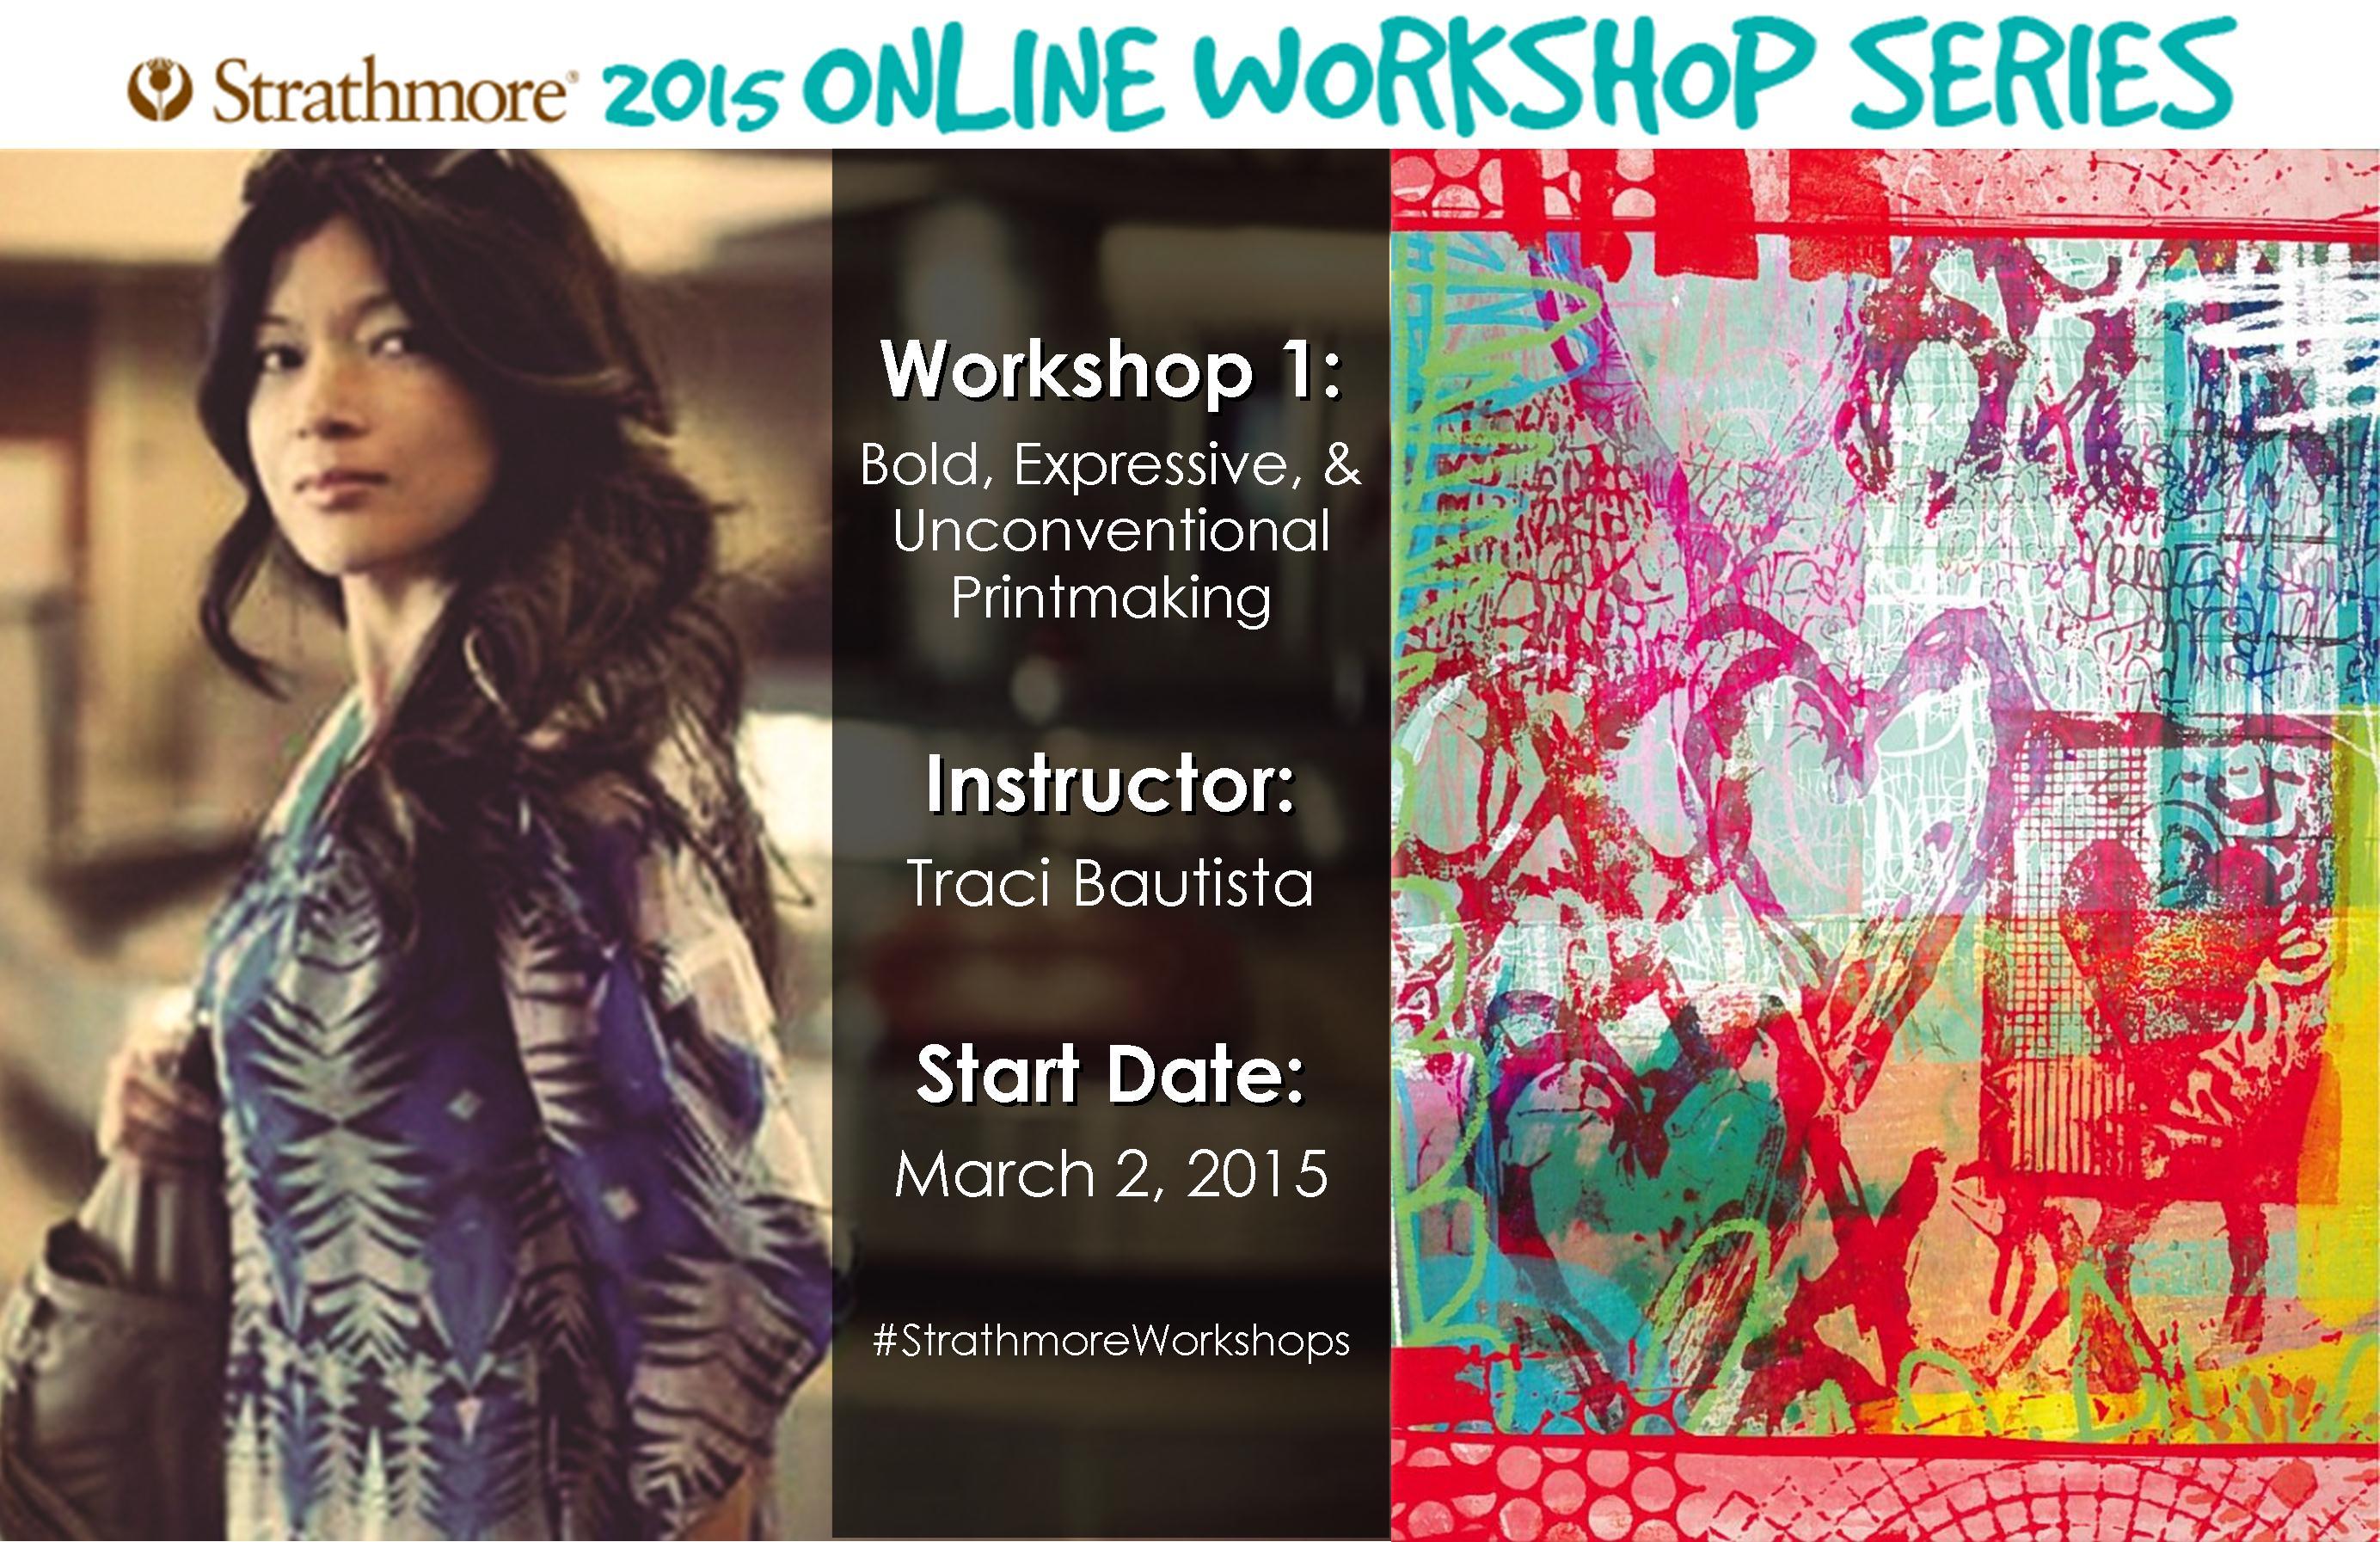 Free 2015 Online Workshops Strathmore Artist Papers